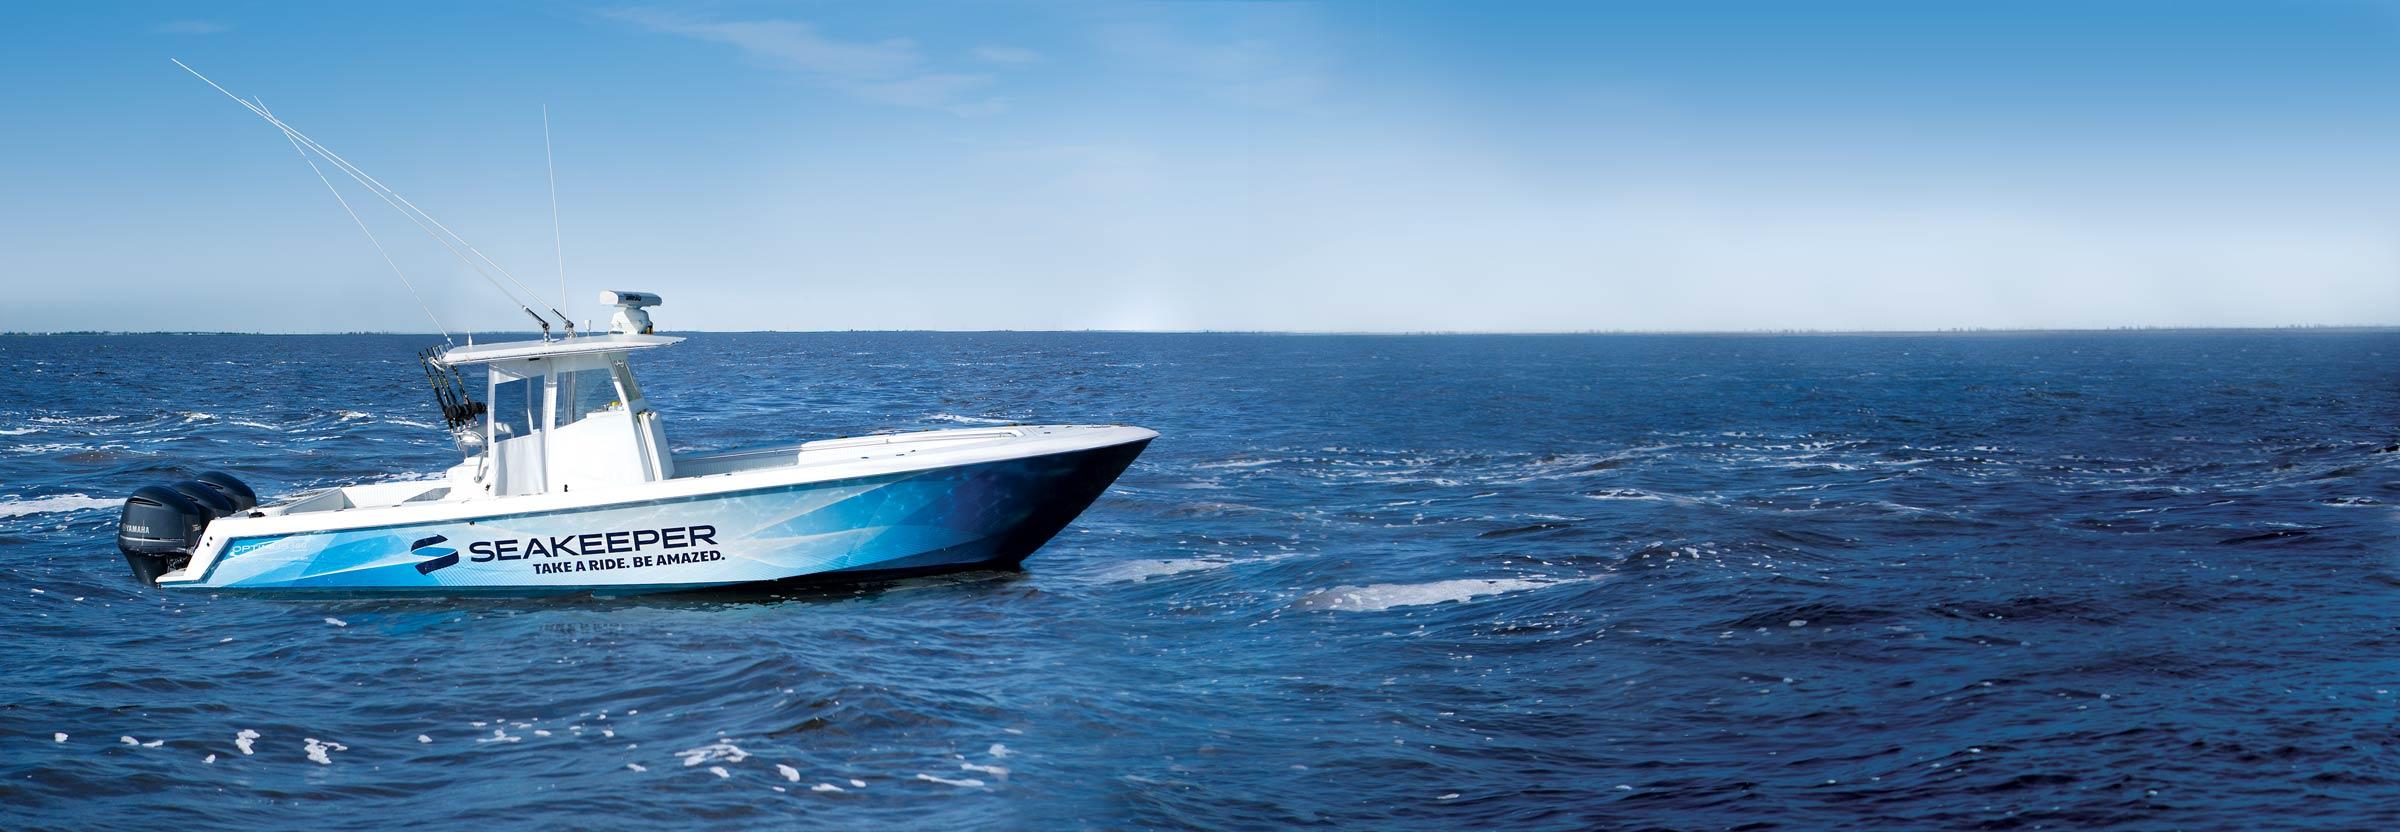 Seakeeper Demo Boat